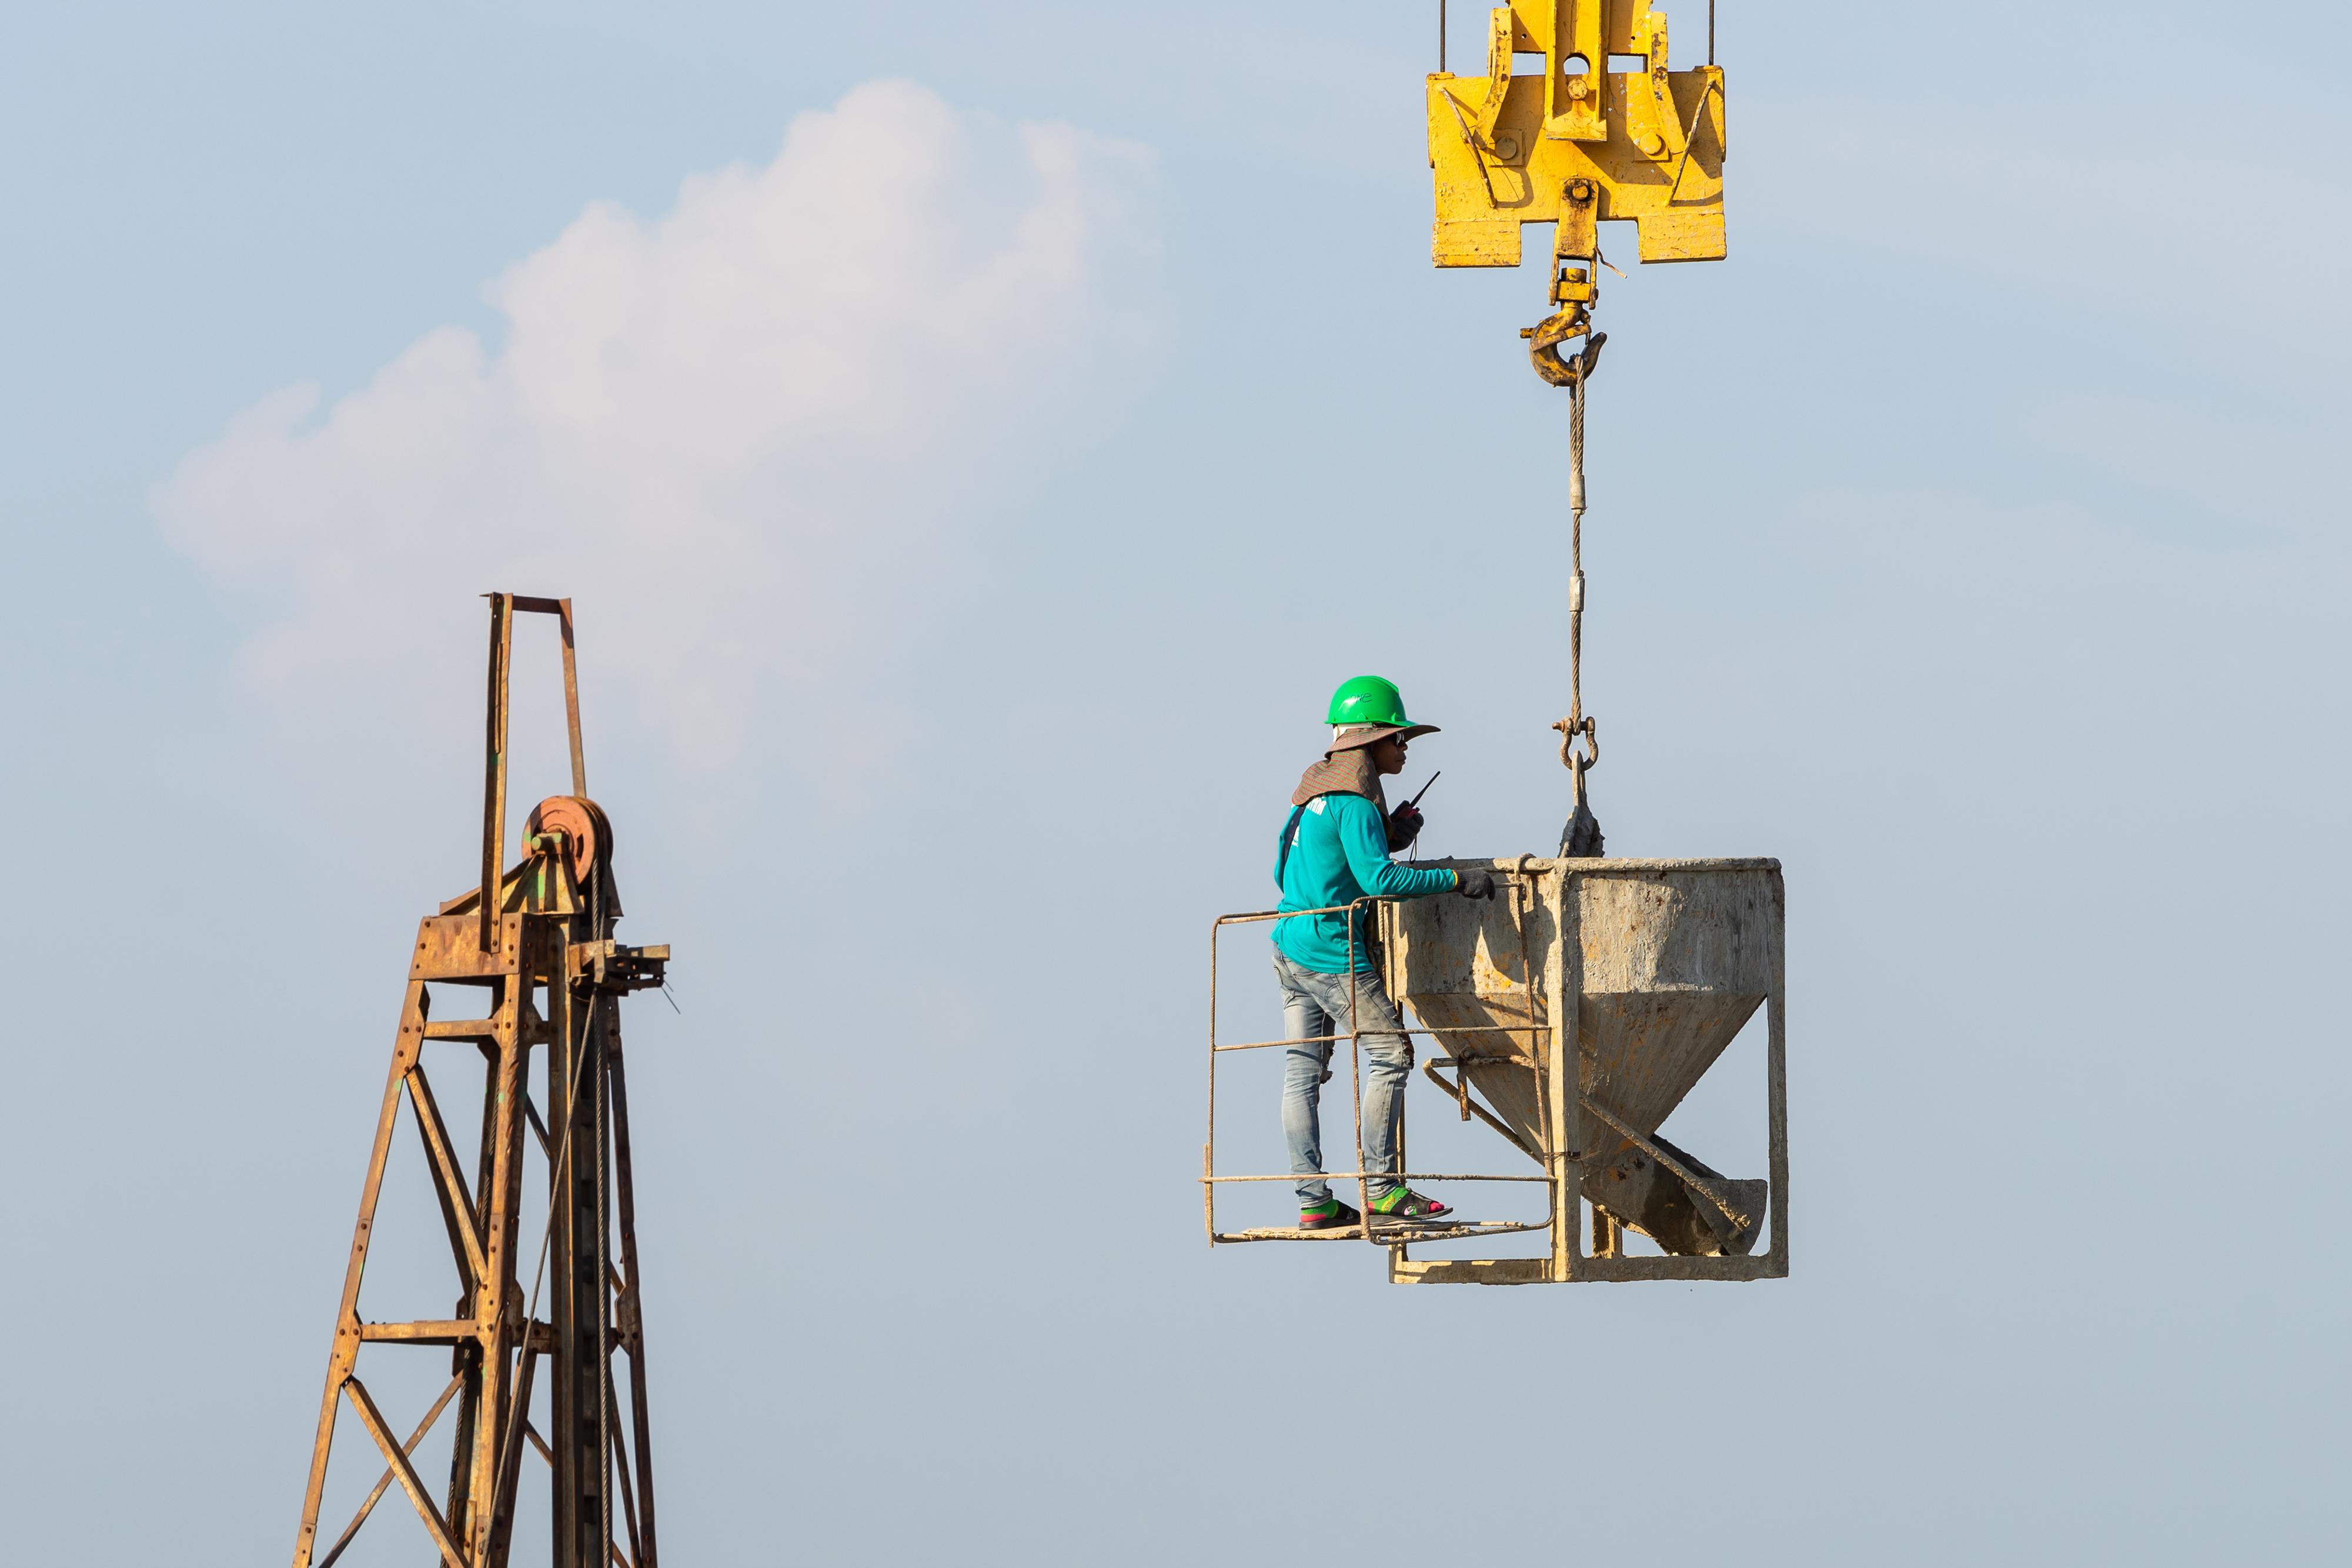 workers-work-crane-construction-site.jpg